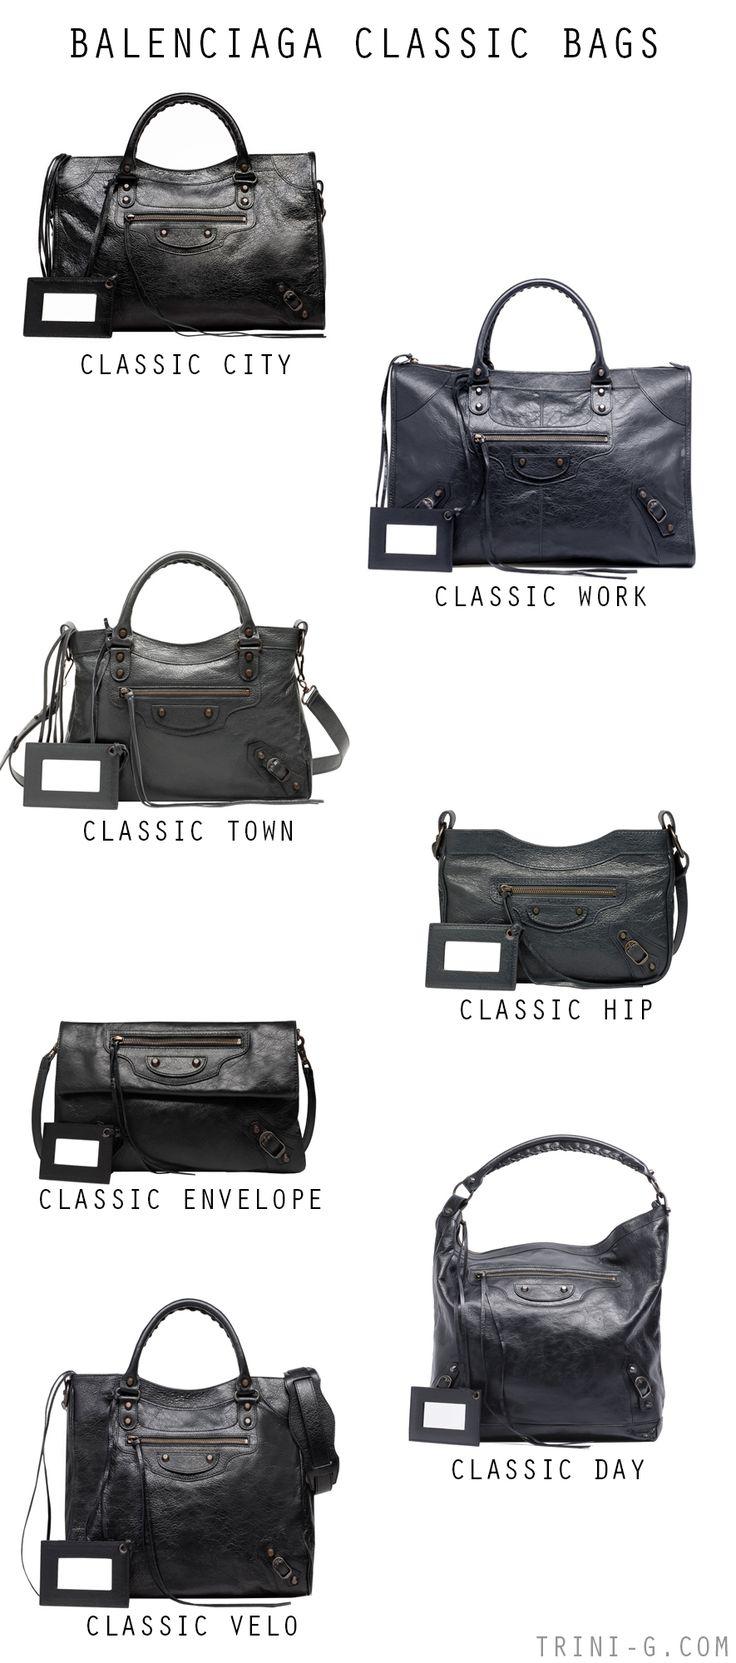 Balenciaga Classic Bags ❤️